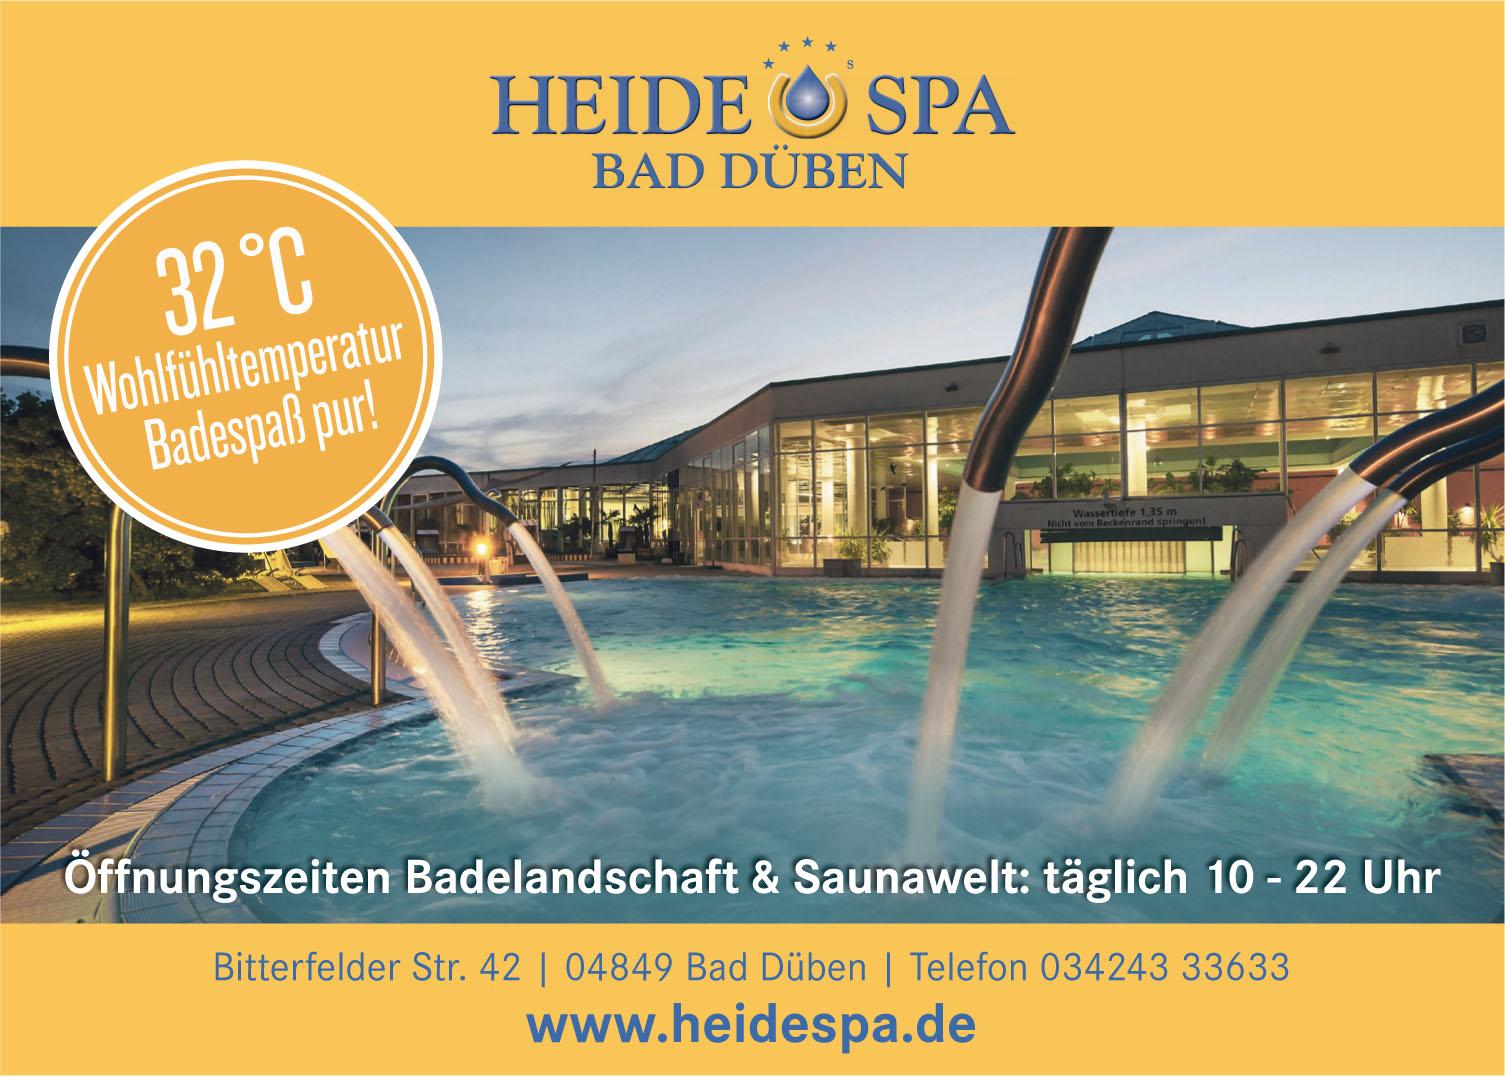 Heide Spa Bad Düben